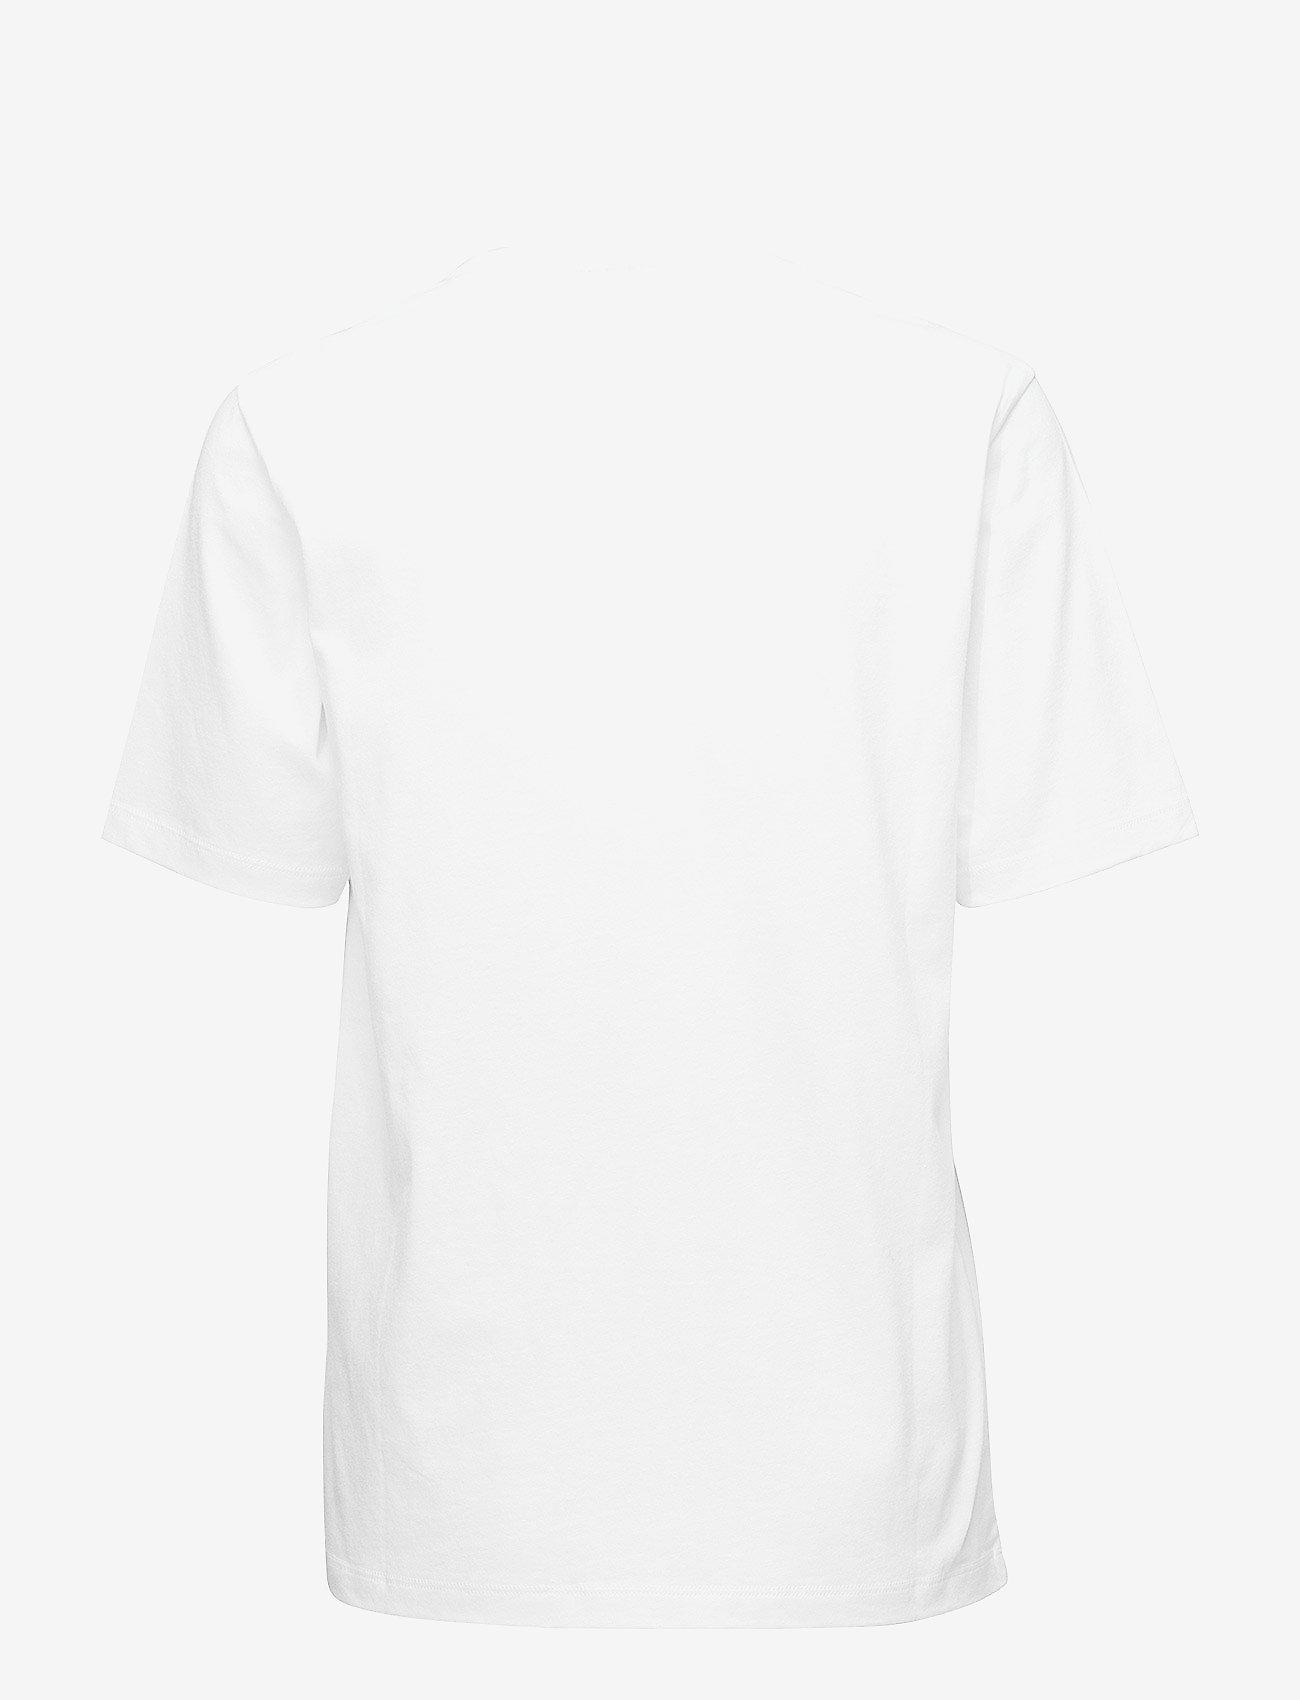 J. Lindeberg Elin Supima Cotton - T-shirts & Tops WHITE